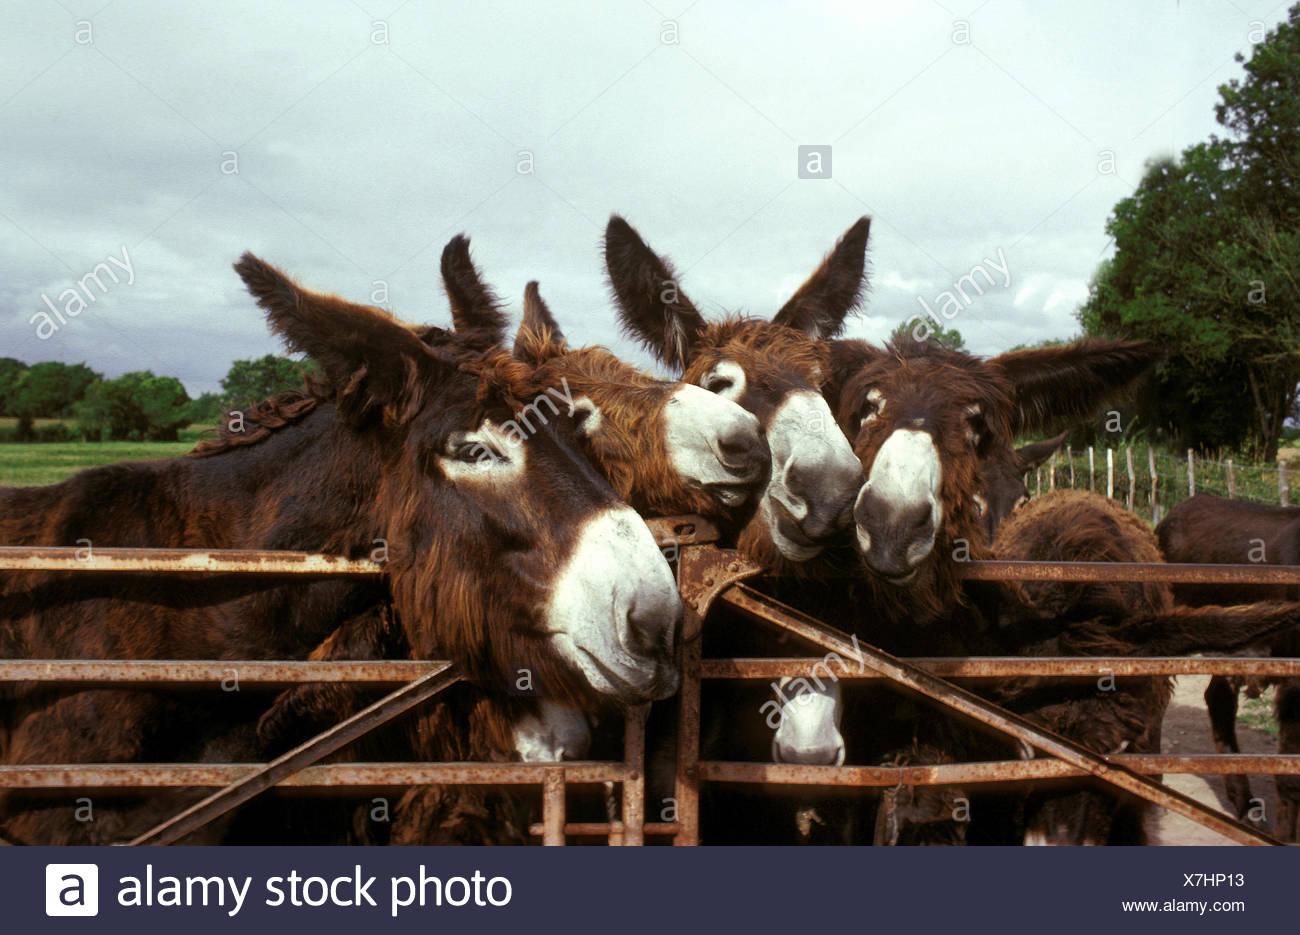 Poitou Donkey or Baudet du Poitou, a French Breed, Group at Paddock's Door - Stock Image